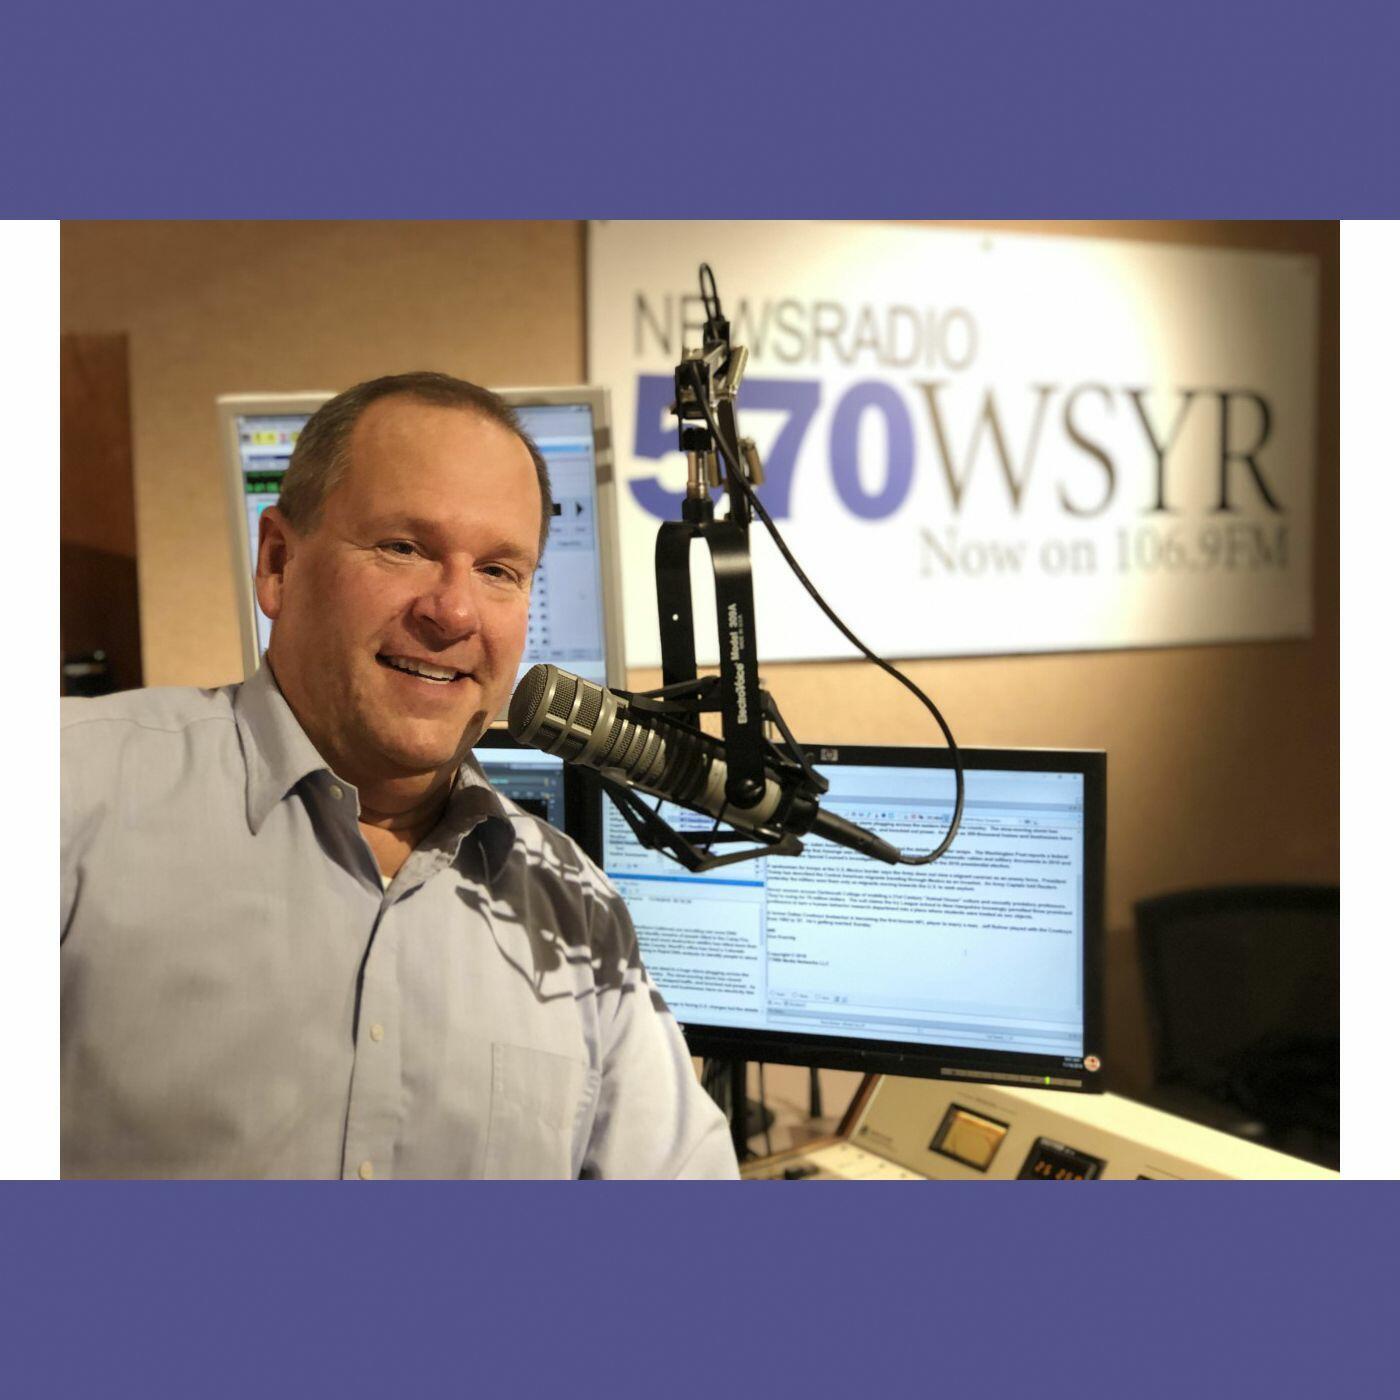 Listen to Ursula Rozum, Campaign for New York Health- Healthcare Stories Forum | Dave Allen On 570 WSYR | Podcasts | iHeartRadio